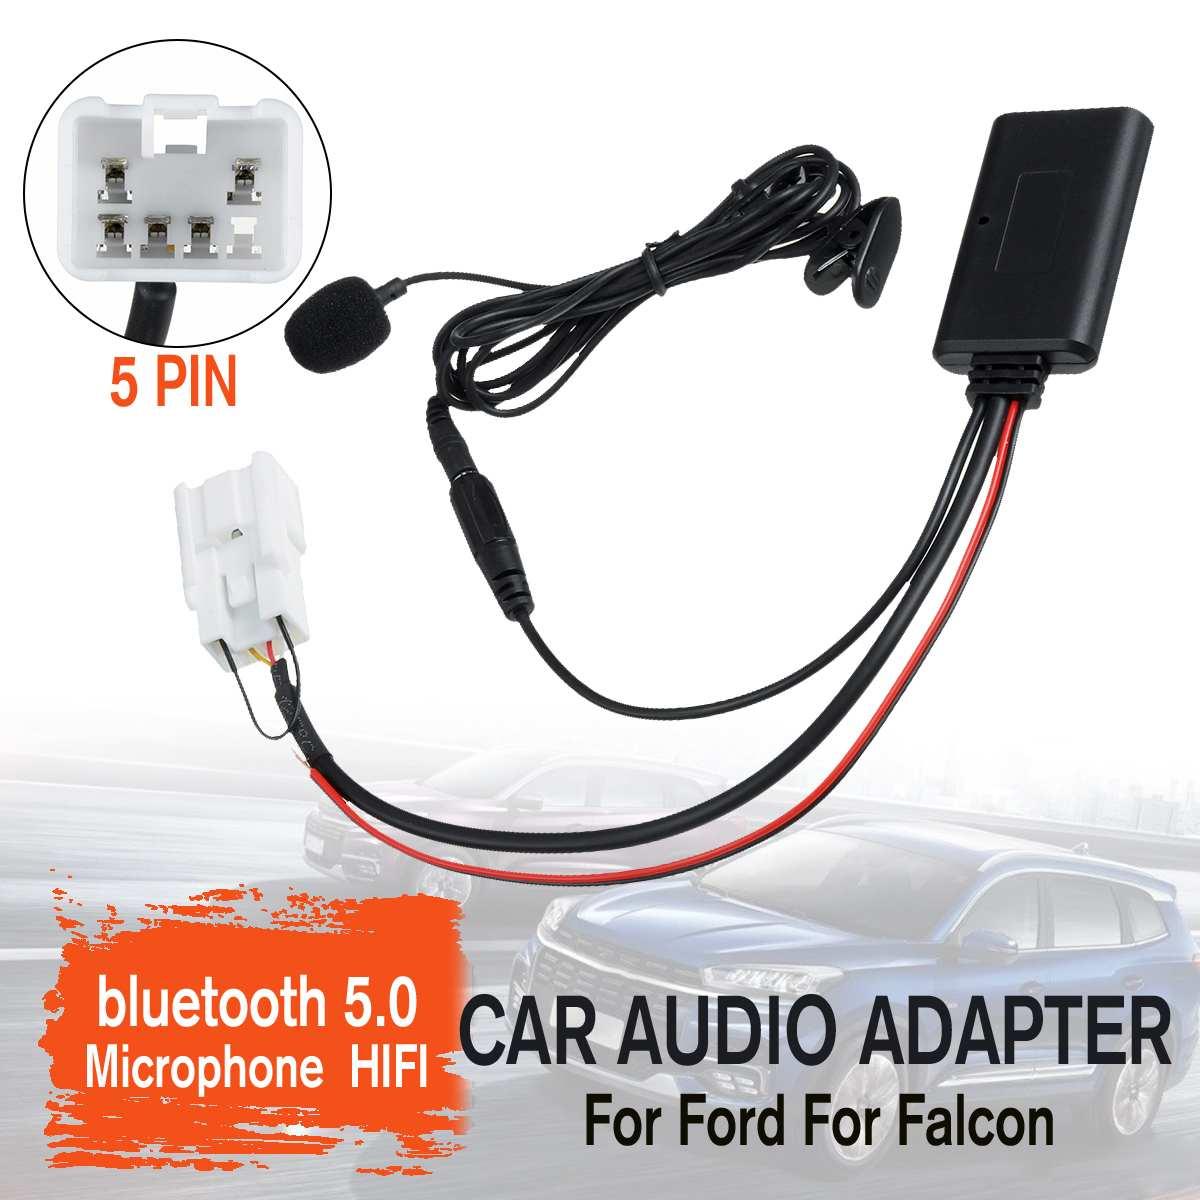 Auto HIFI Wireless 5pin Stereo Radio Aux In MP3 Kabel Musik Player Adapter MIC Für Ford Für Falcon